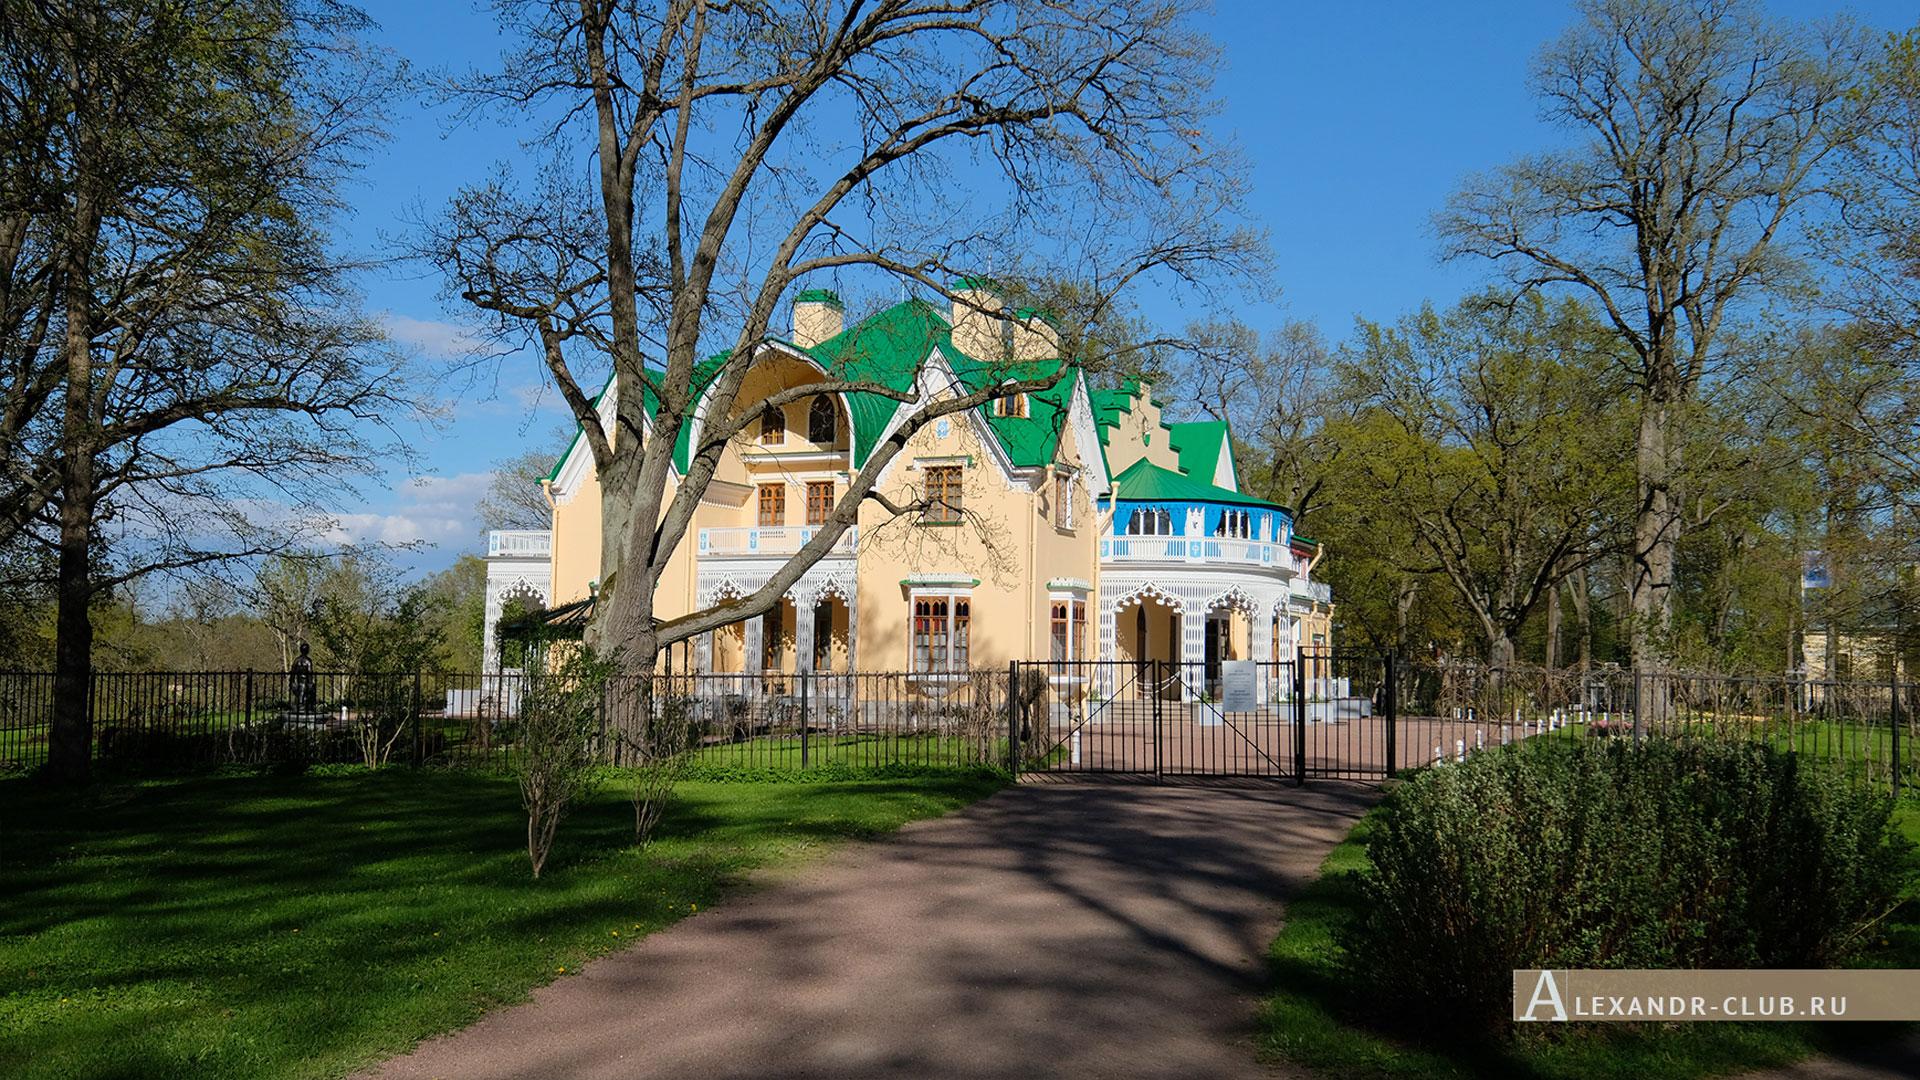 Петергоф, парк «Александрия», весна, дворец Коттедж